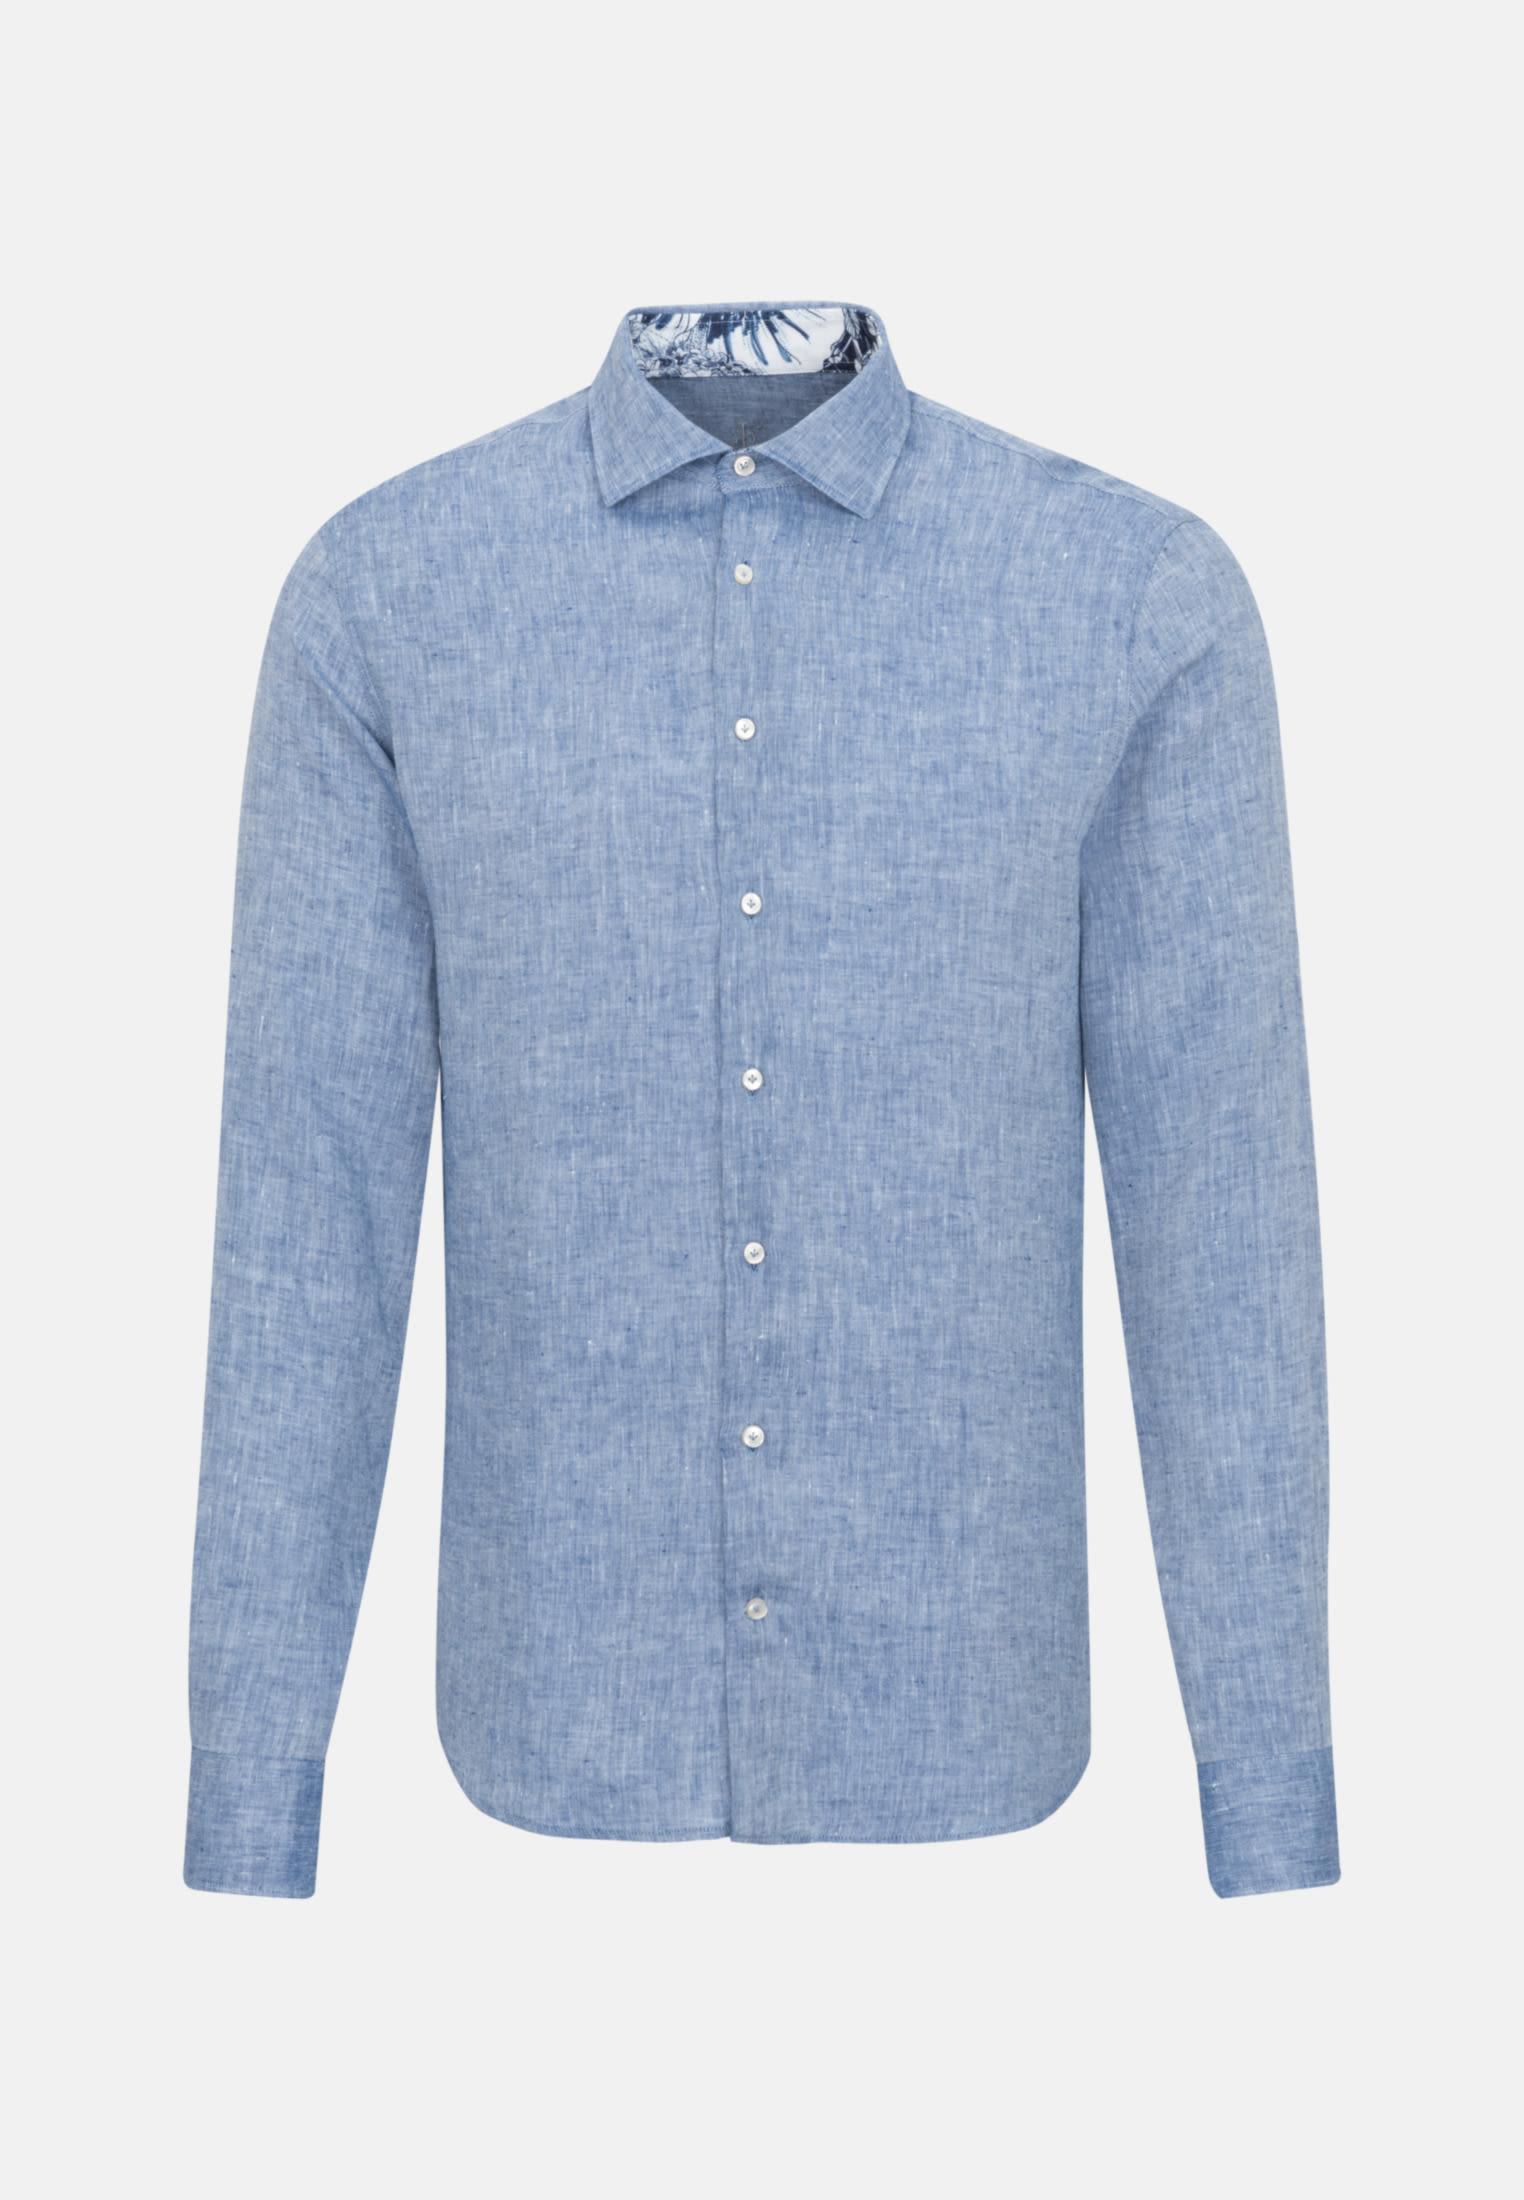 Leinen Smart Casual Hemd in Perfect Fit mit Kentkragen in Dunkelblau |  Jacques Britt Onlineshop